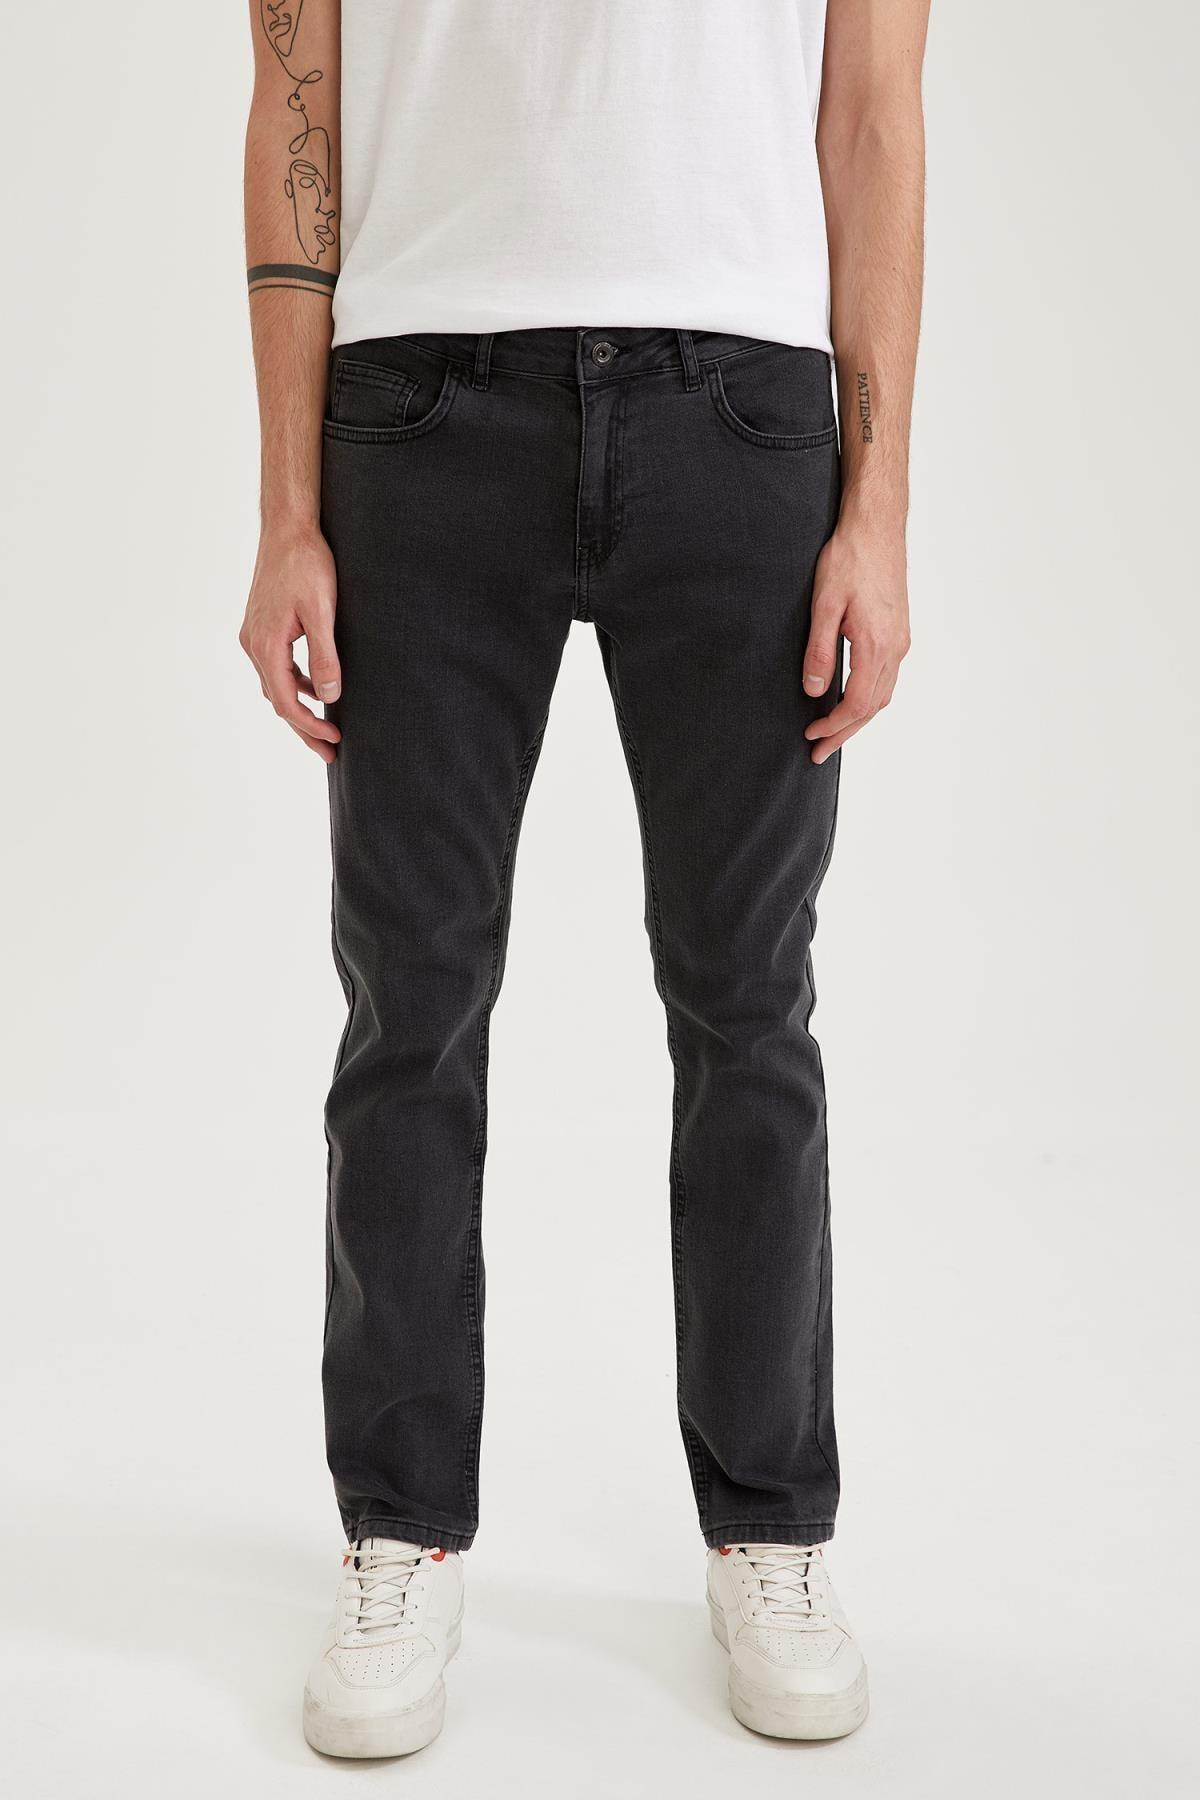 DeFacto Diago Comfort Fit Yüksek Bel Boru Paça Jean Pantolon